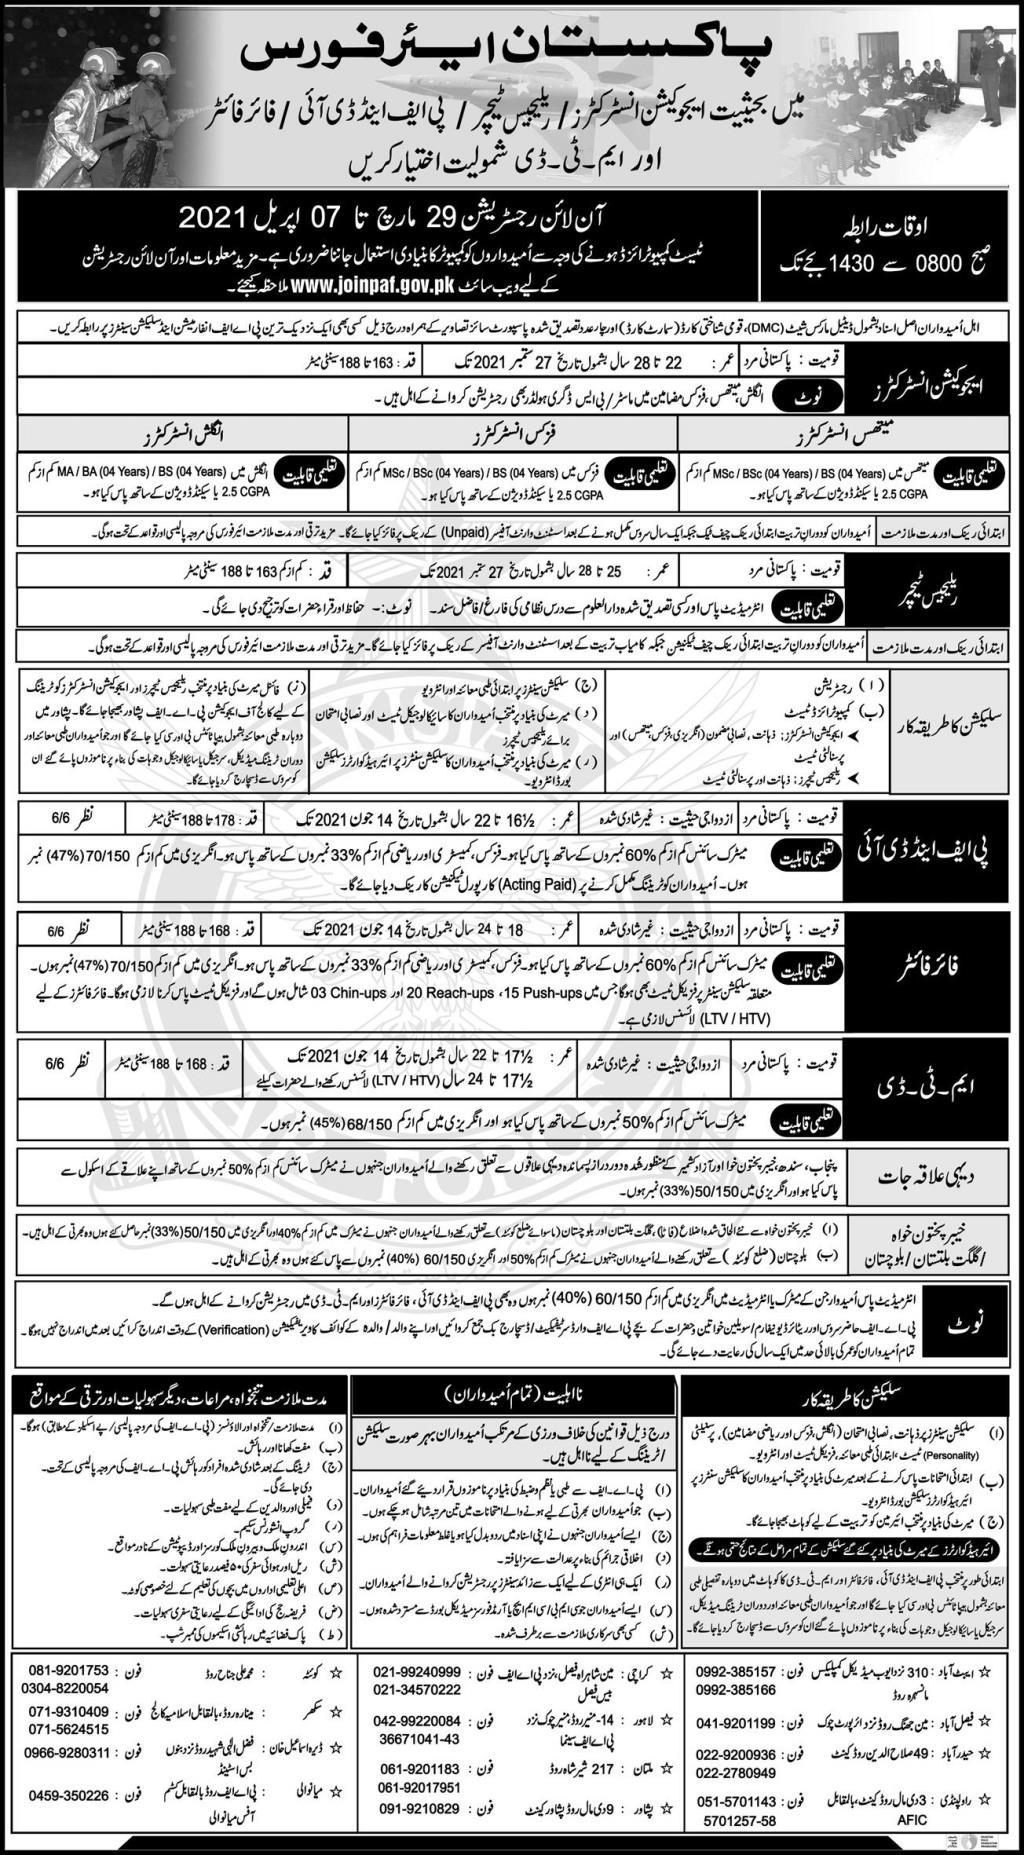 PAF Jobs 2021 - Pakistan Air Force Jobs - Apply Now